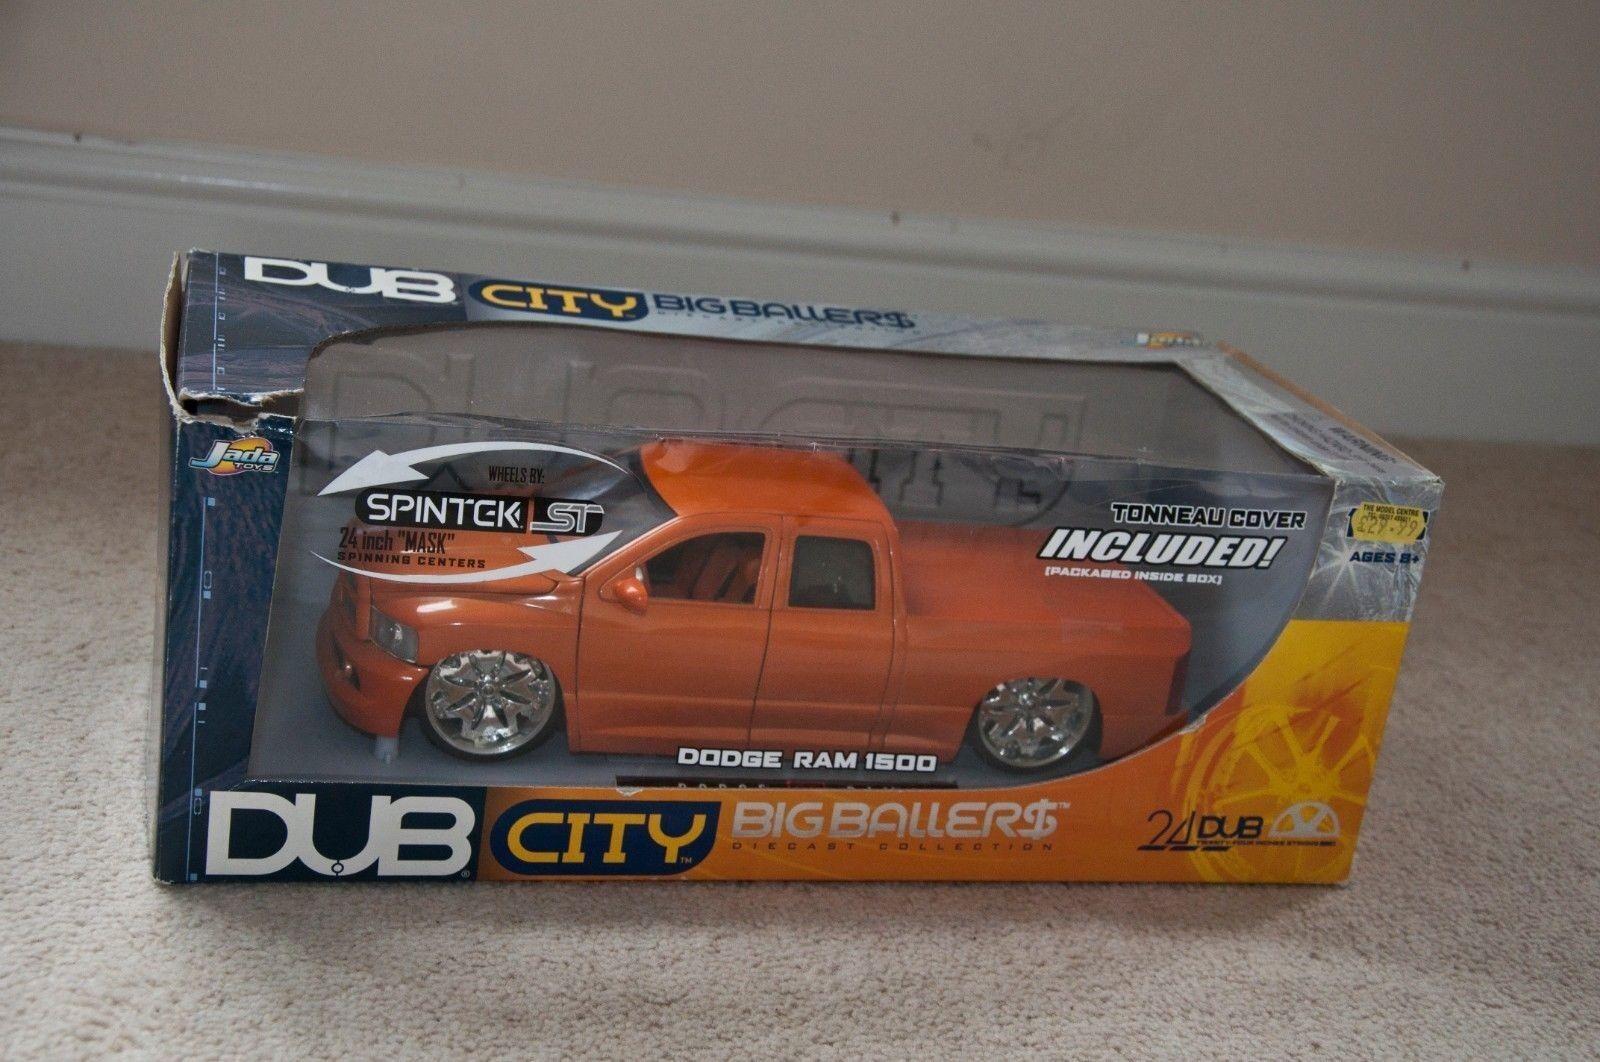 JADA DUB CITY Die-Cast Model Car 1 18 Scale - Dodge - Ram 1500 including tonneau